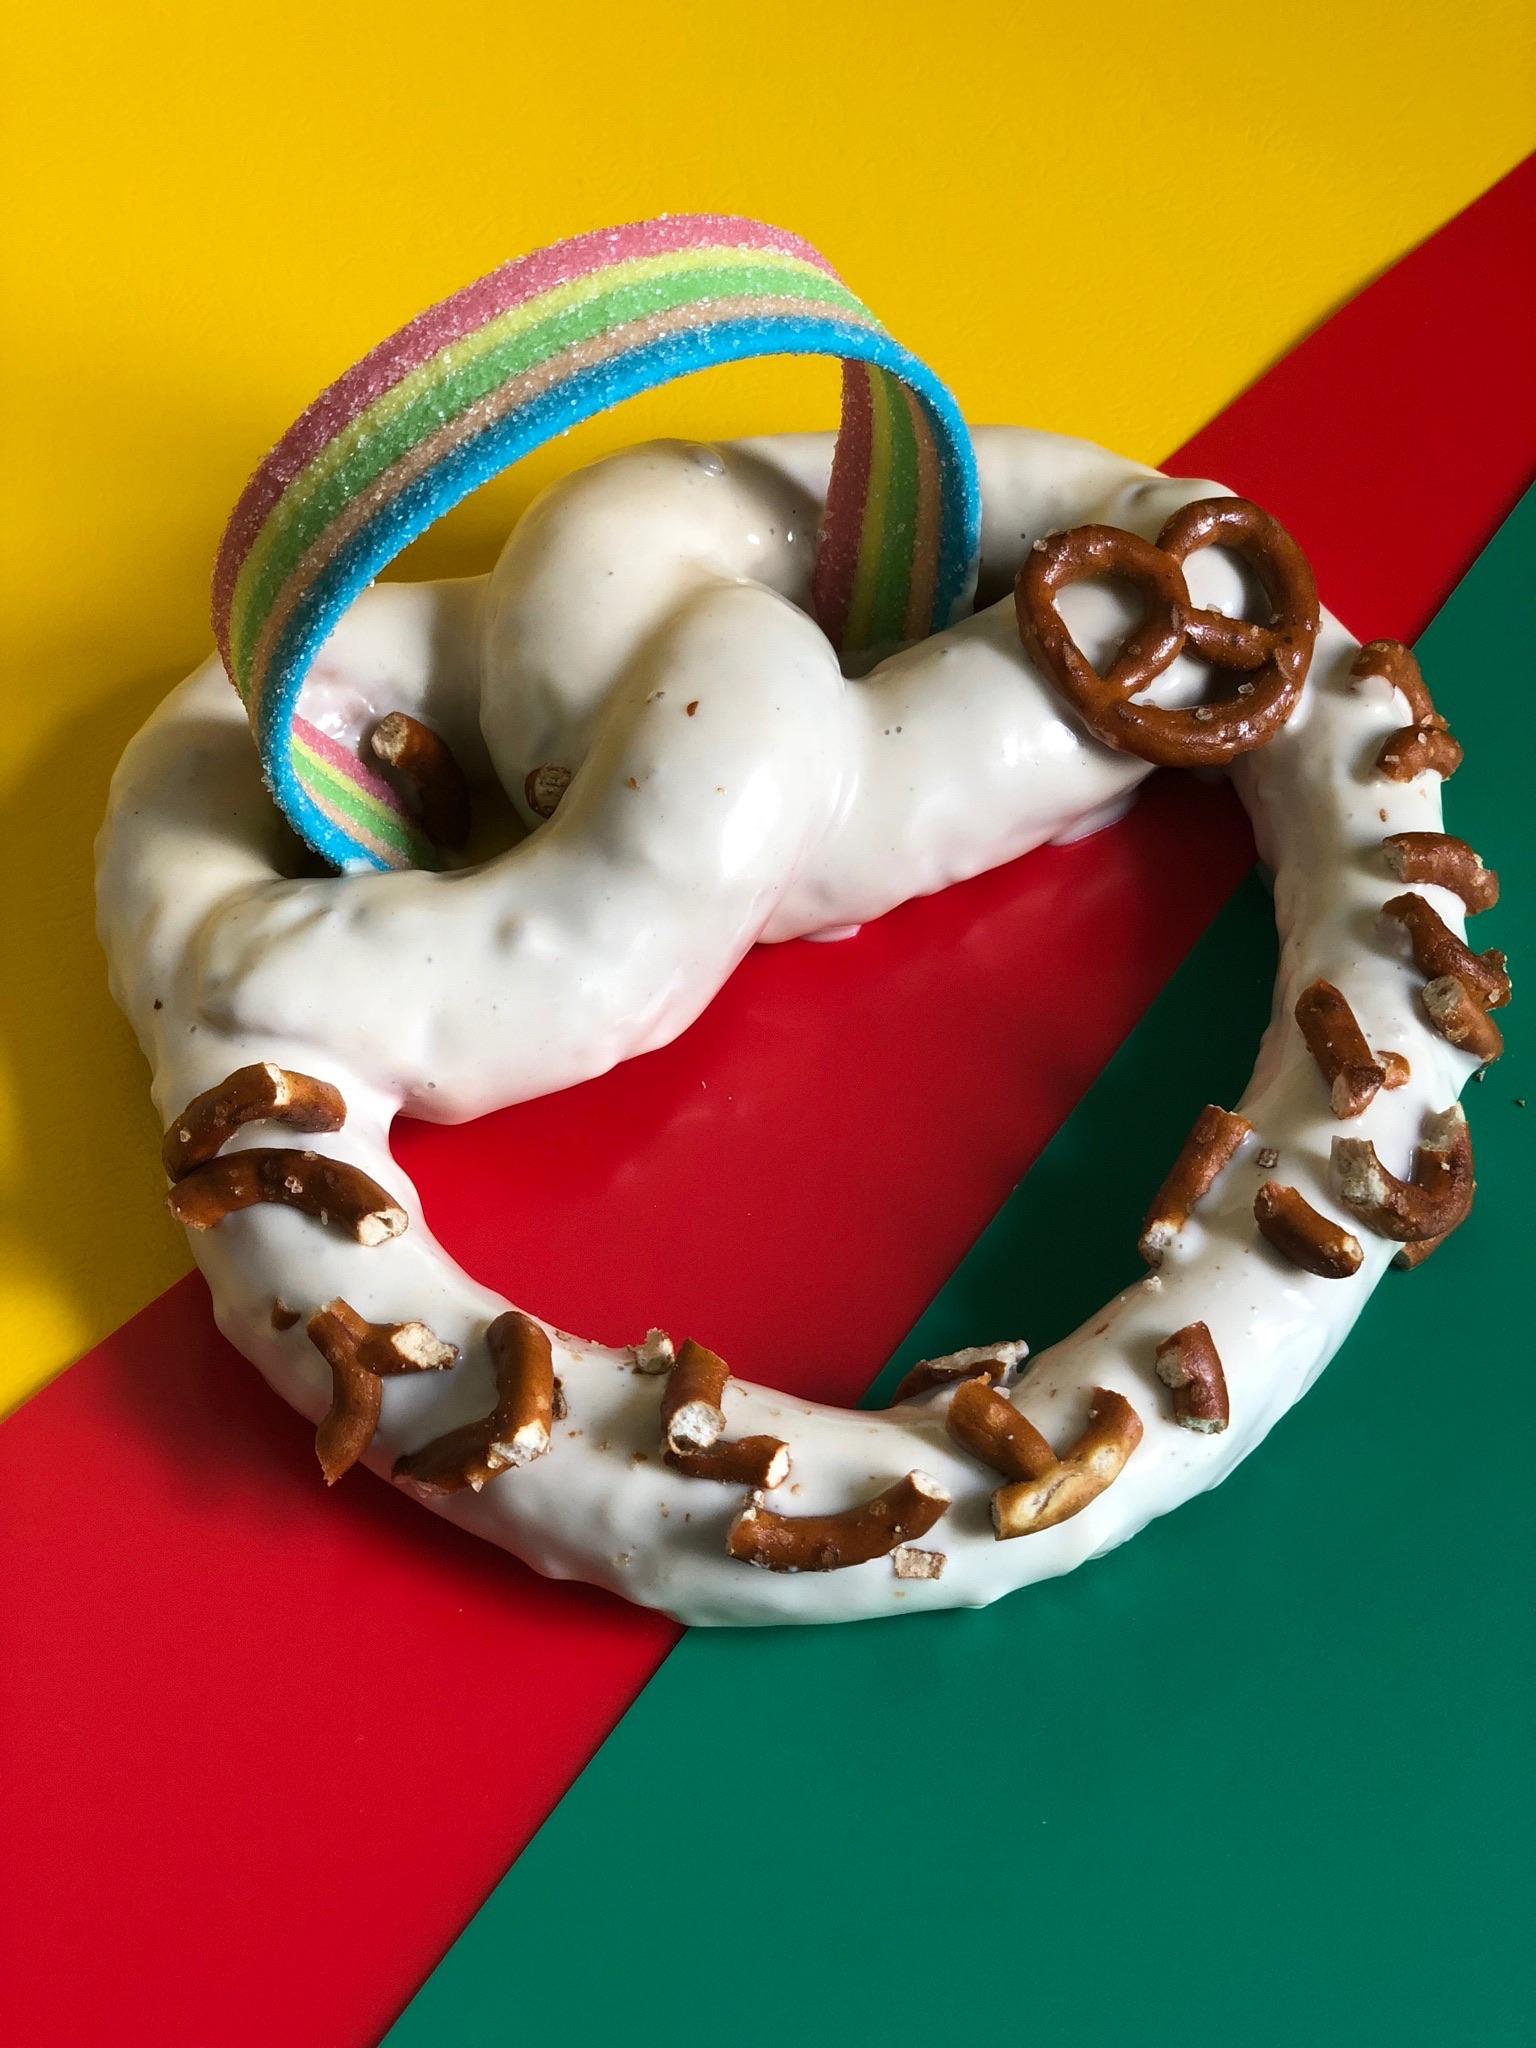 קינוח Queen pretzel (צילום: דניאלה שלו)